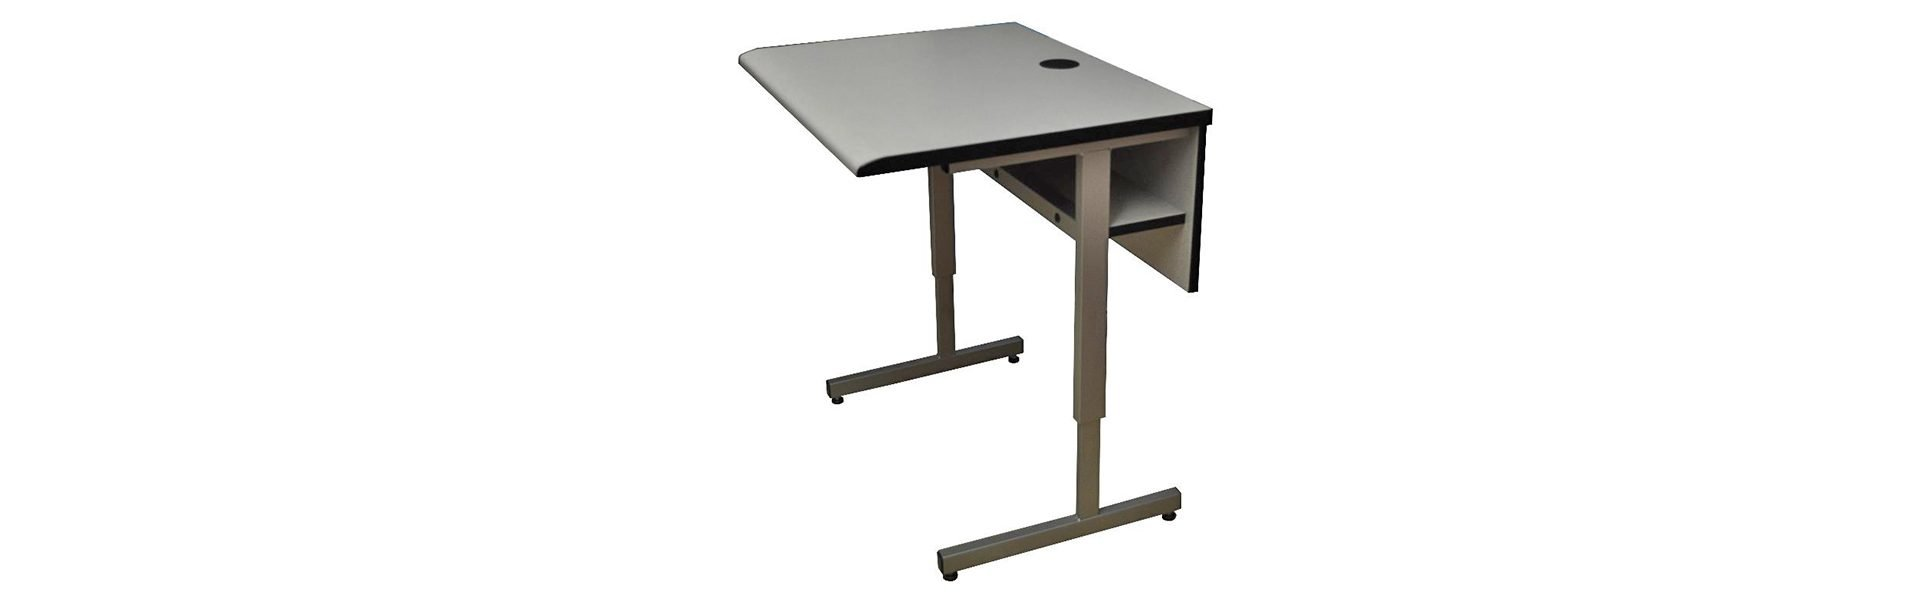 Corilam 8300 Series 527-A Desk